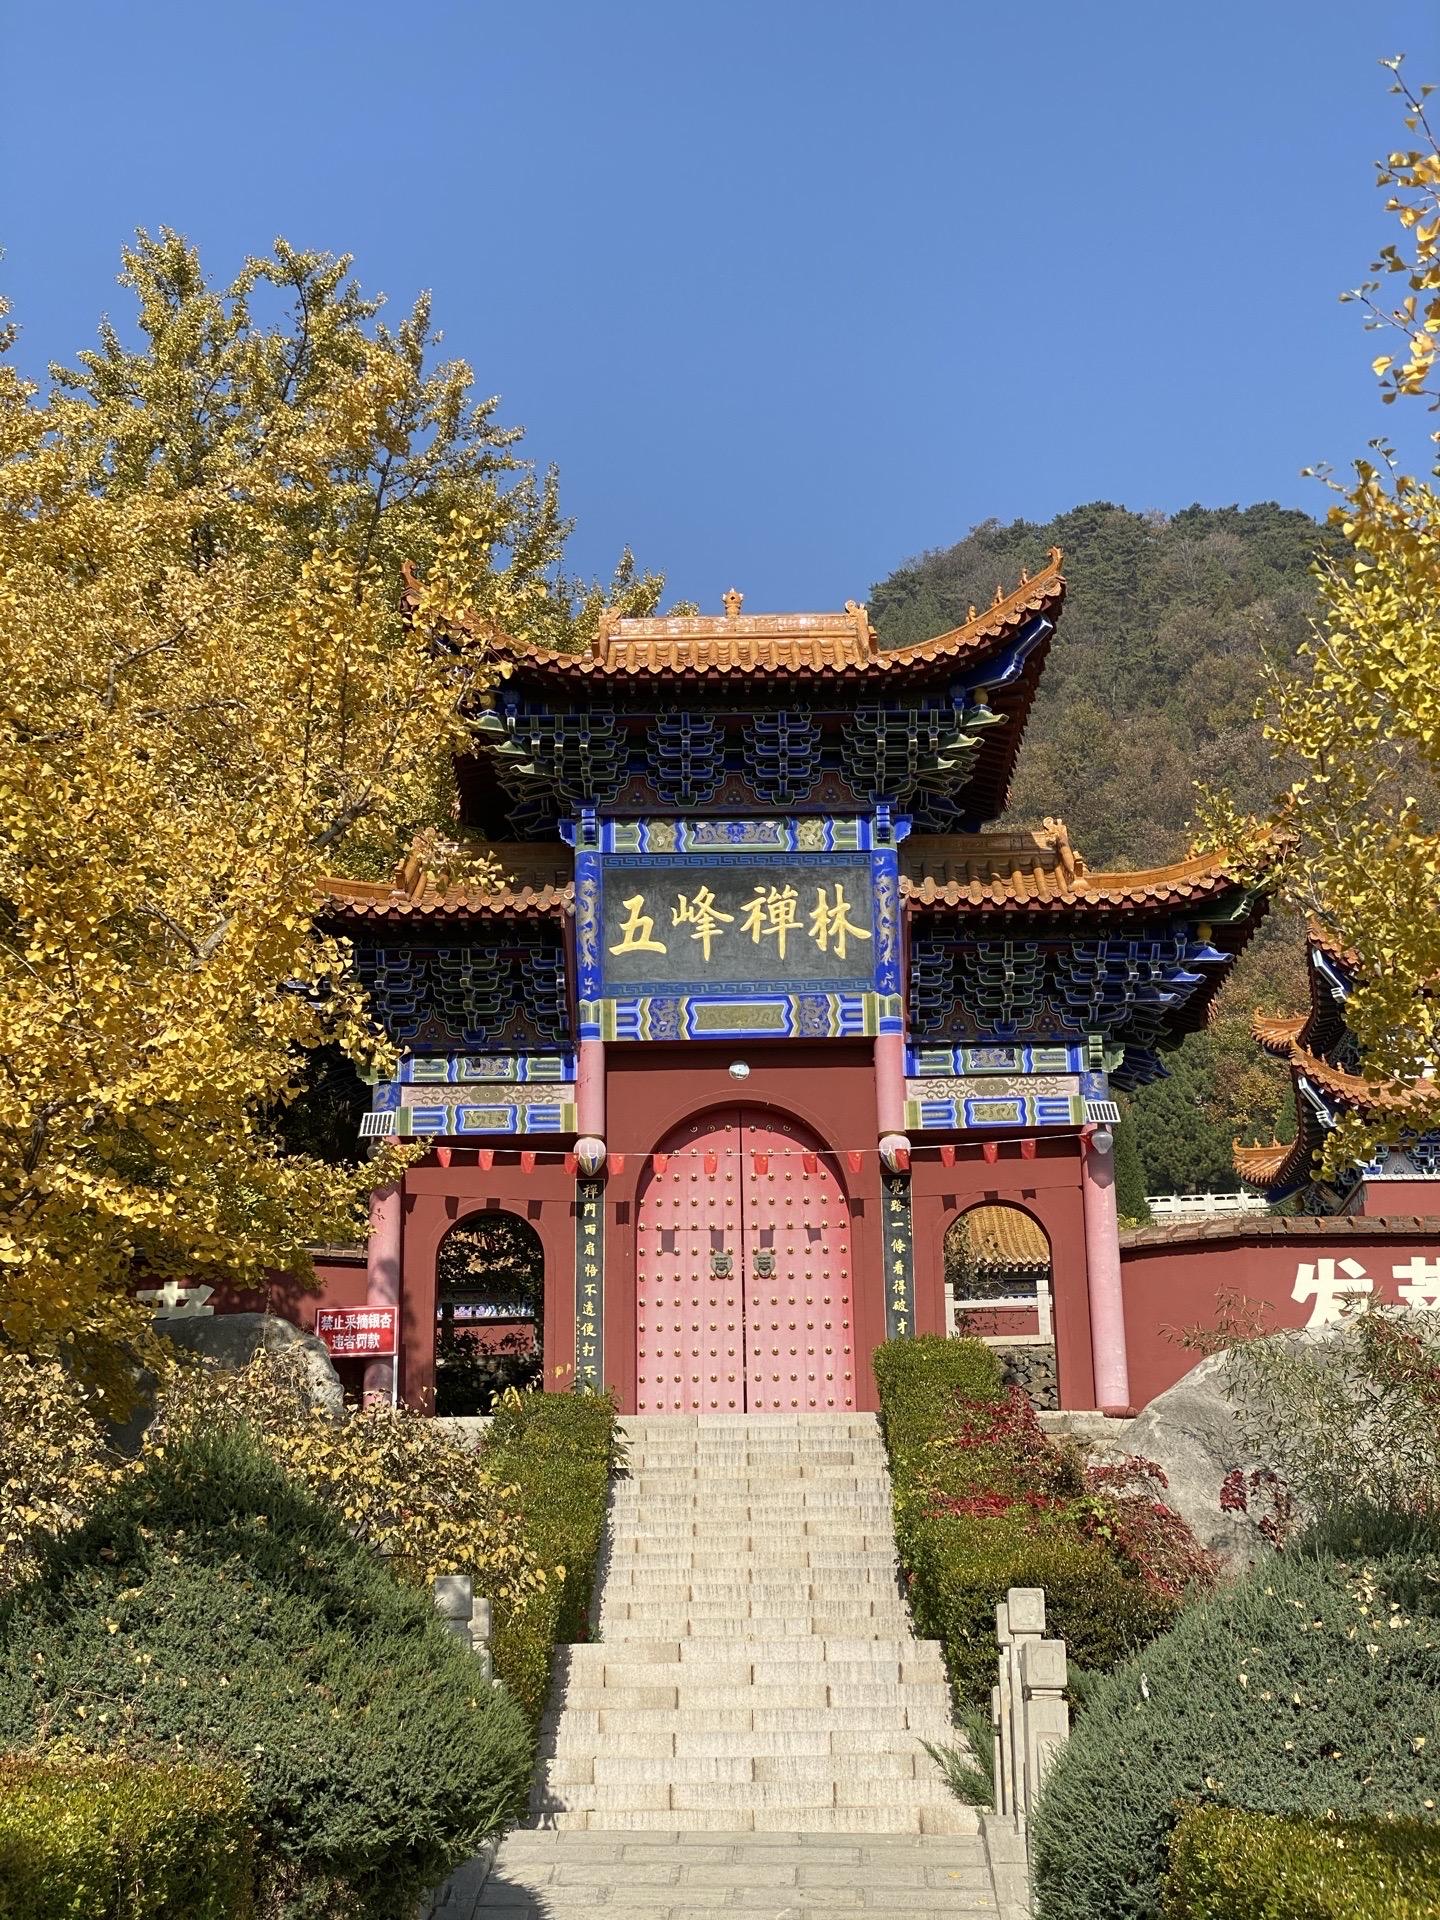 Ancient Ginkgo Garden of Chanlin Temple